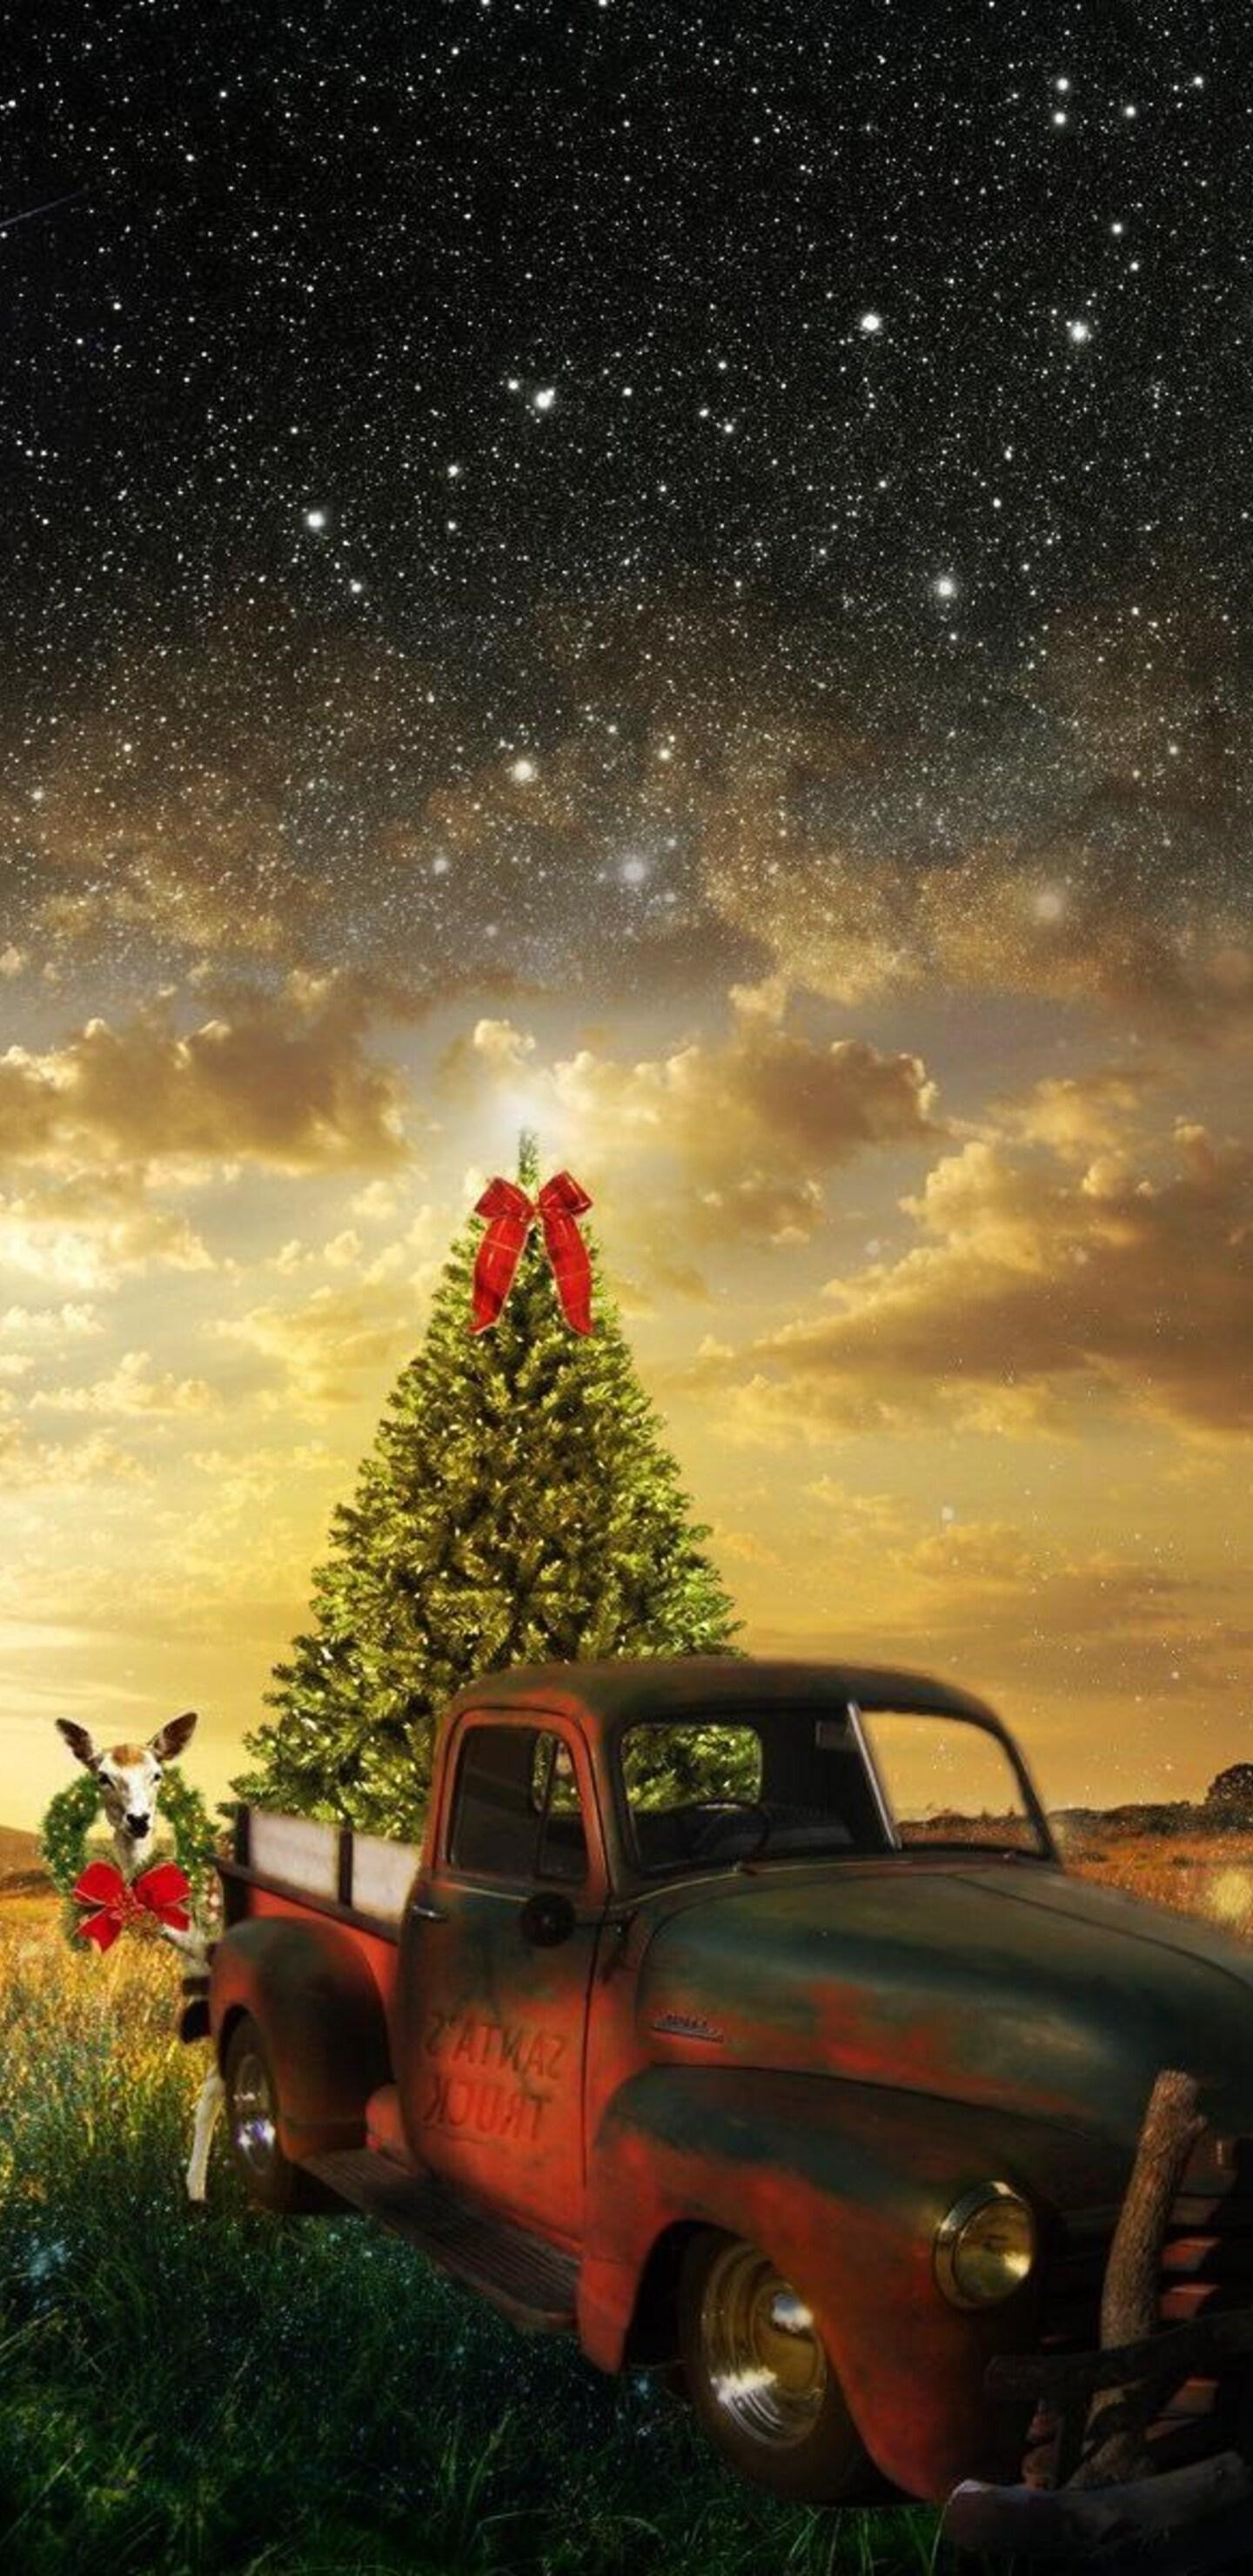 1440x2960 Christmas Magic Samsung Galaxy Note 9 8 S9 S8 S8 Qhd Hd